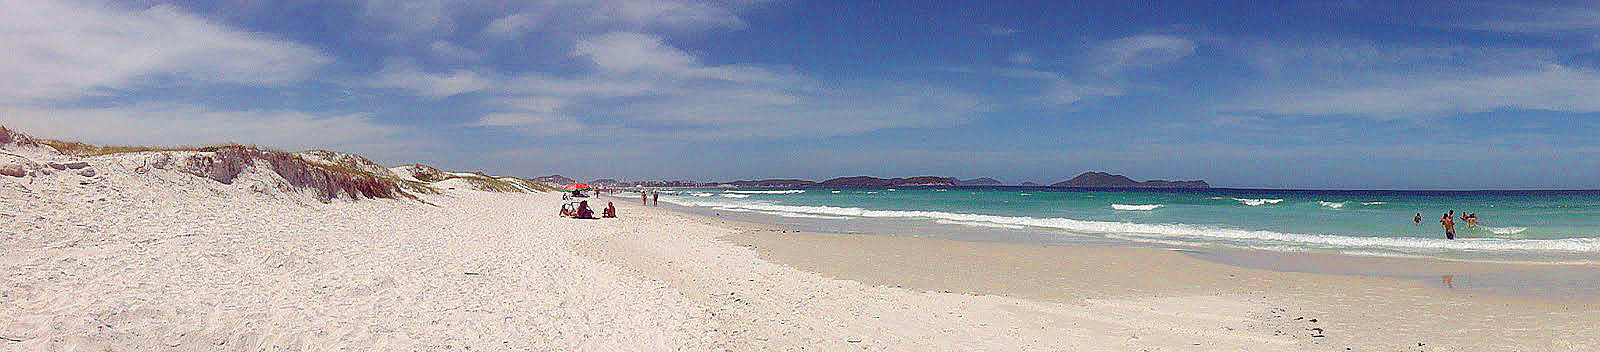 Praia das Dunas - Cabo Frio - por vipareifotografei